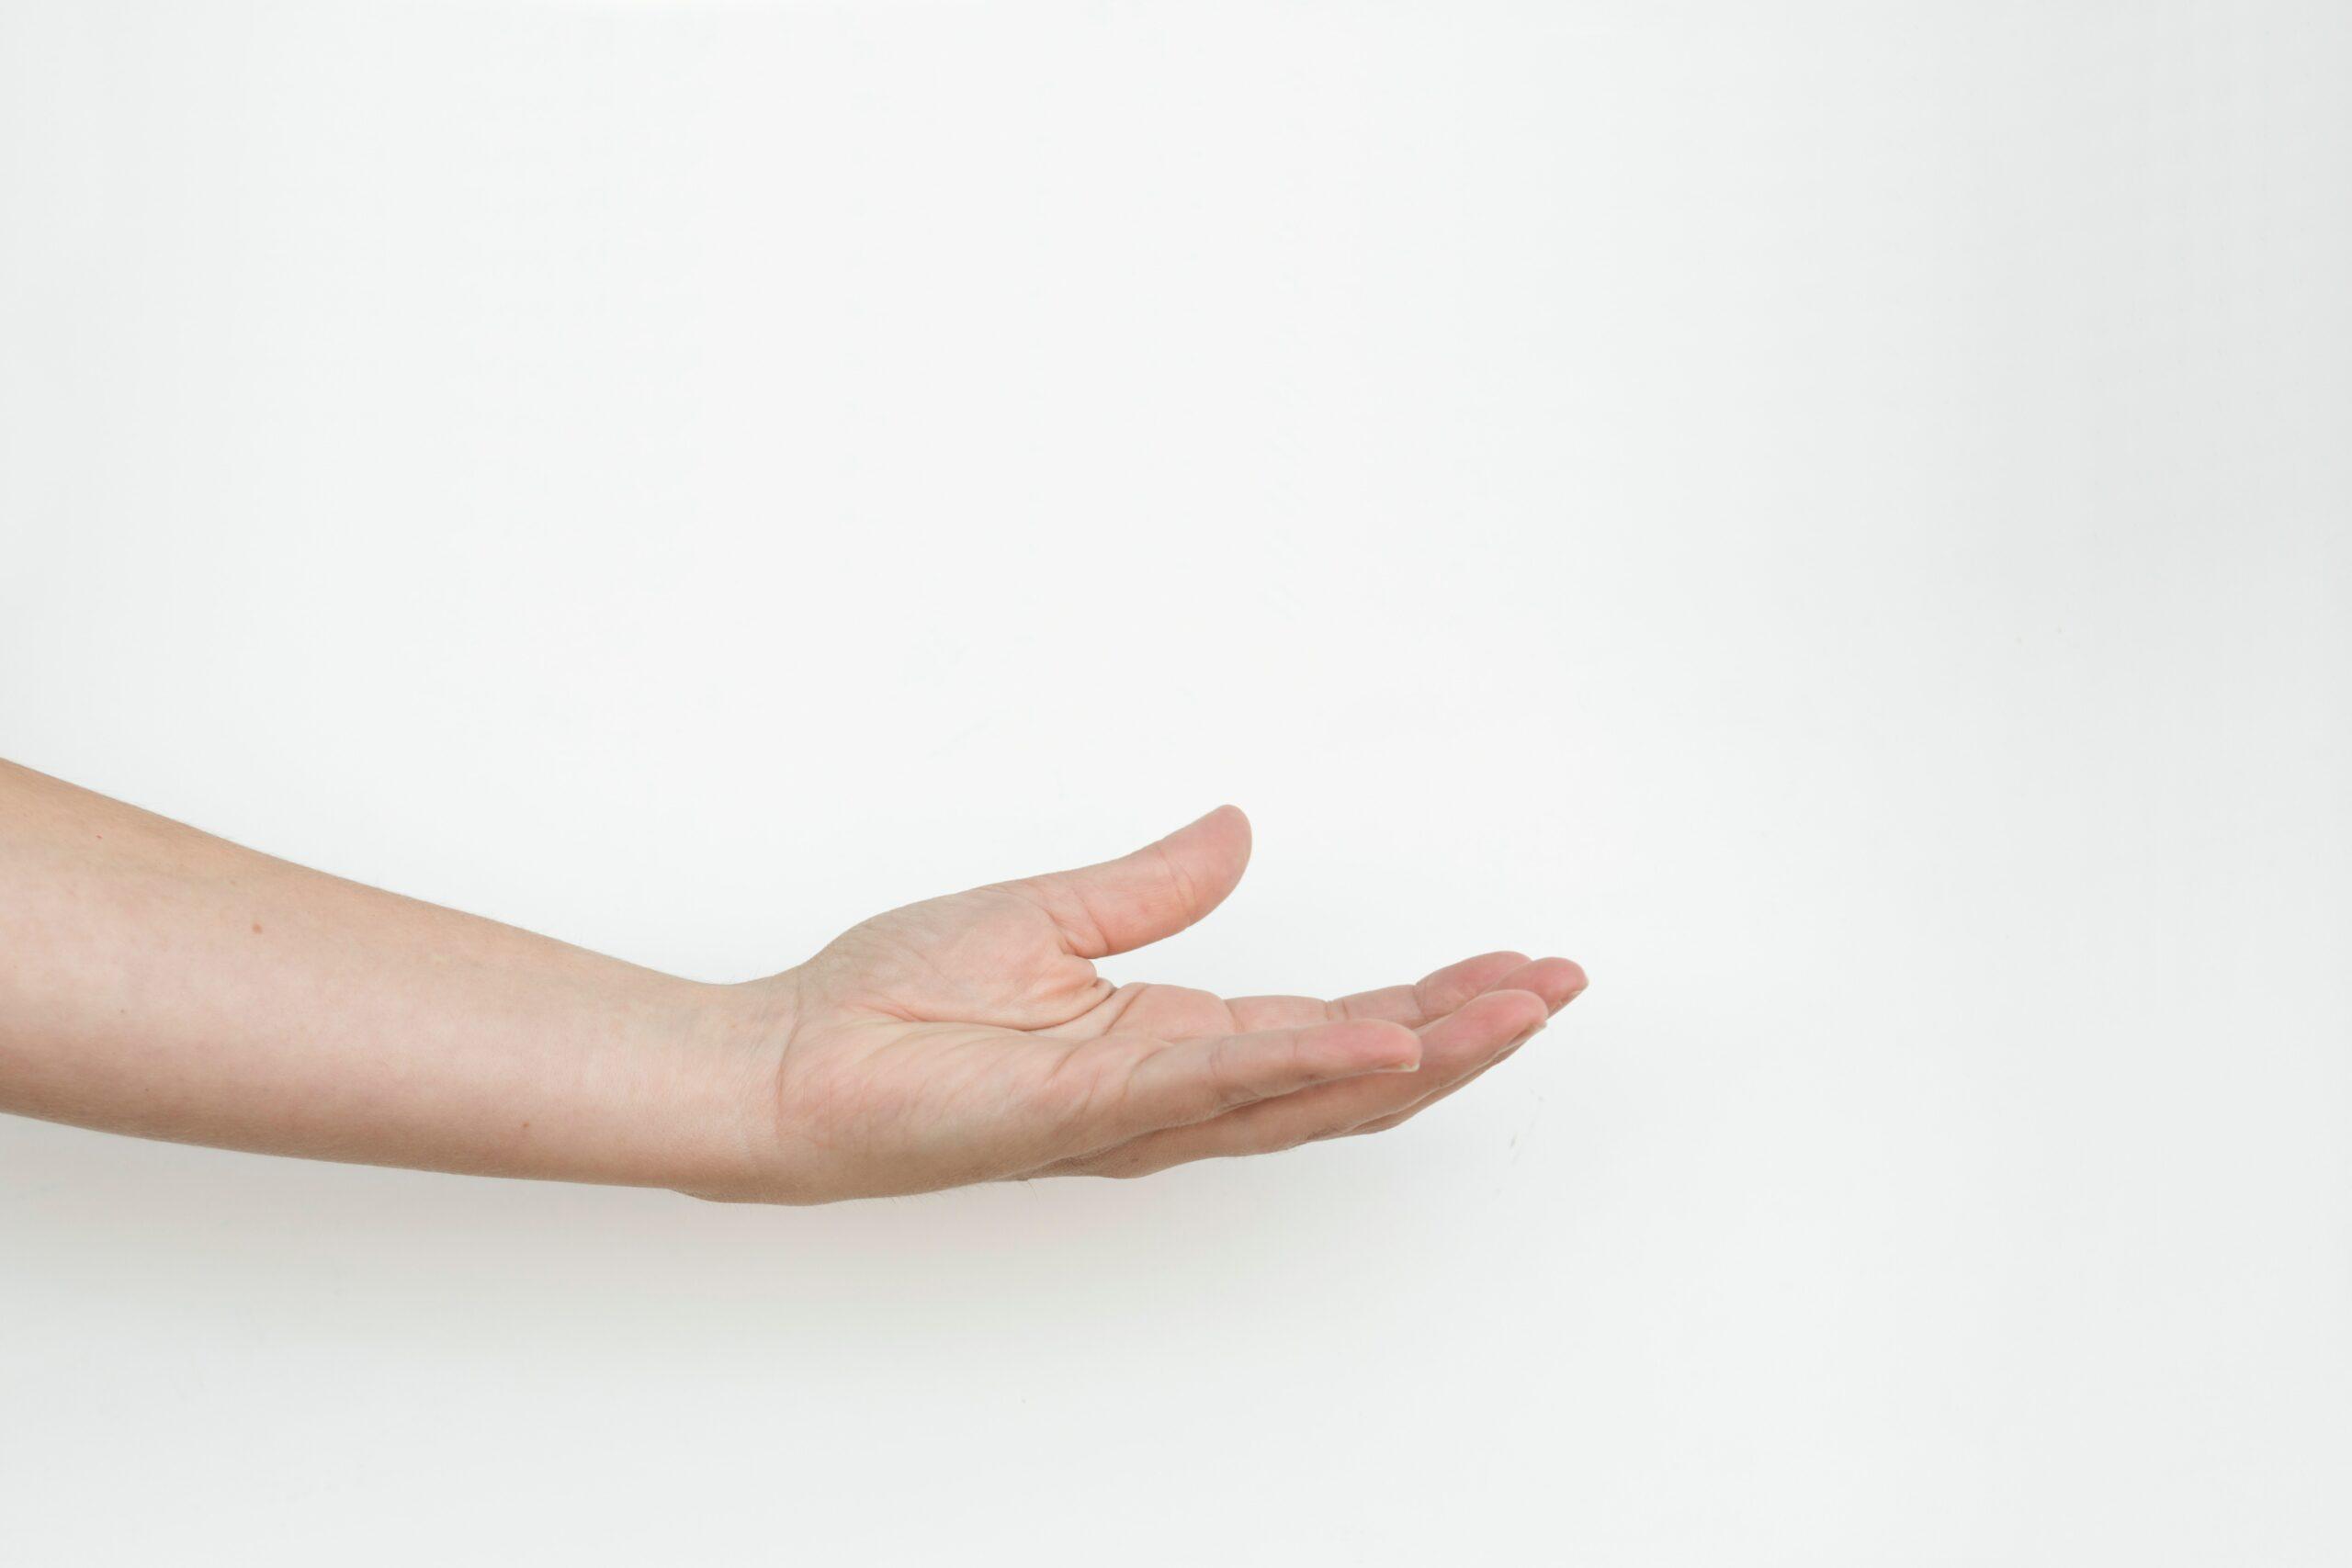 le bras de trop